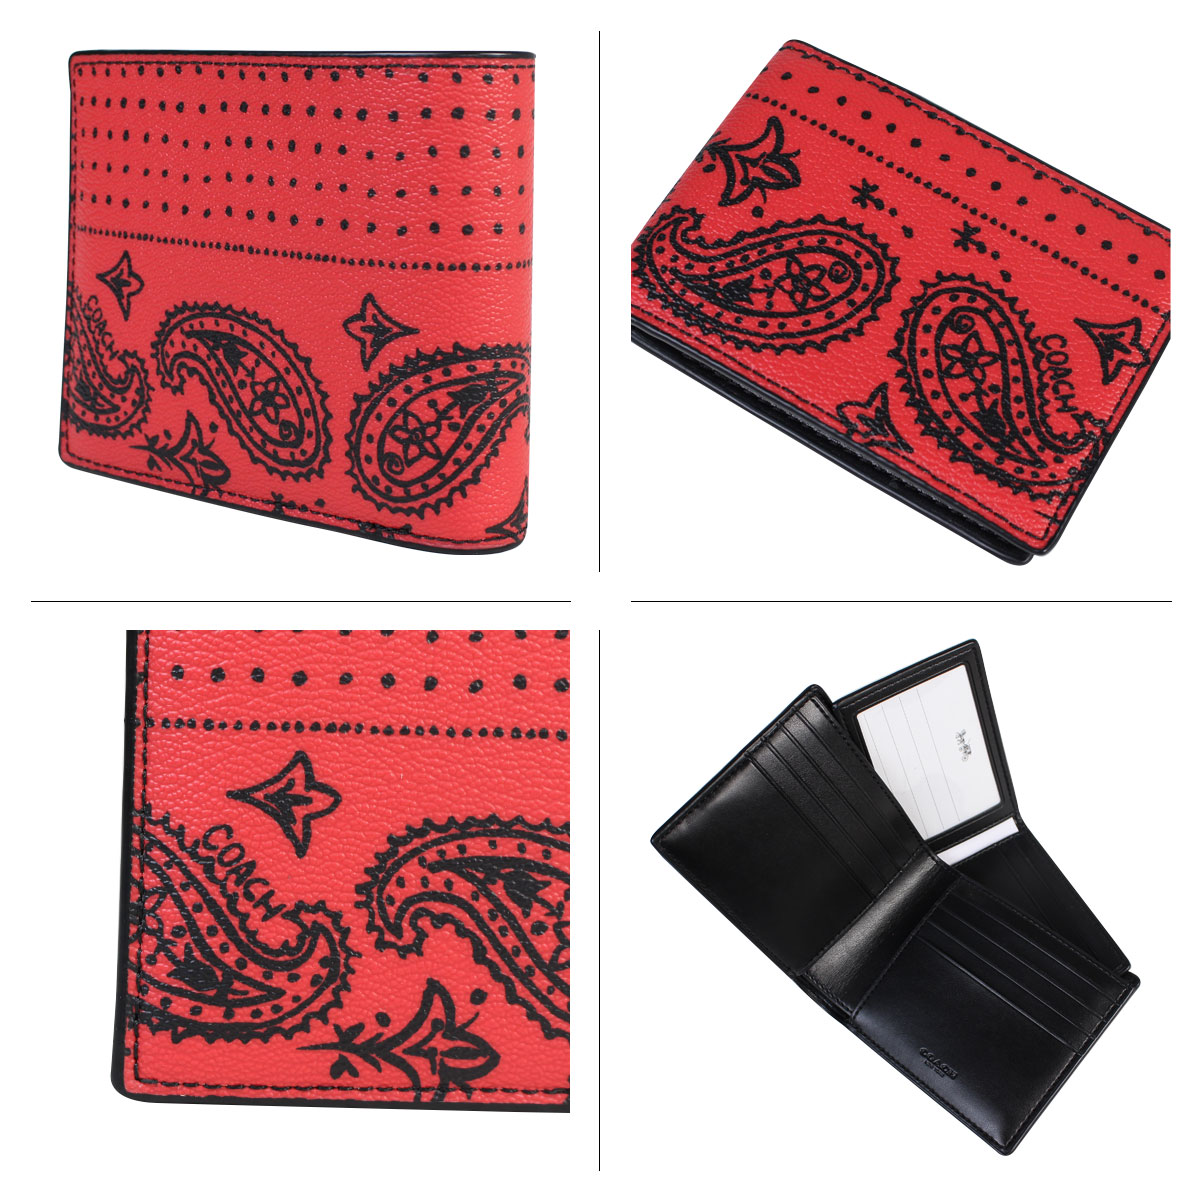 Coach COACH wallet folio men leather F57653 red black bandana